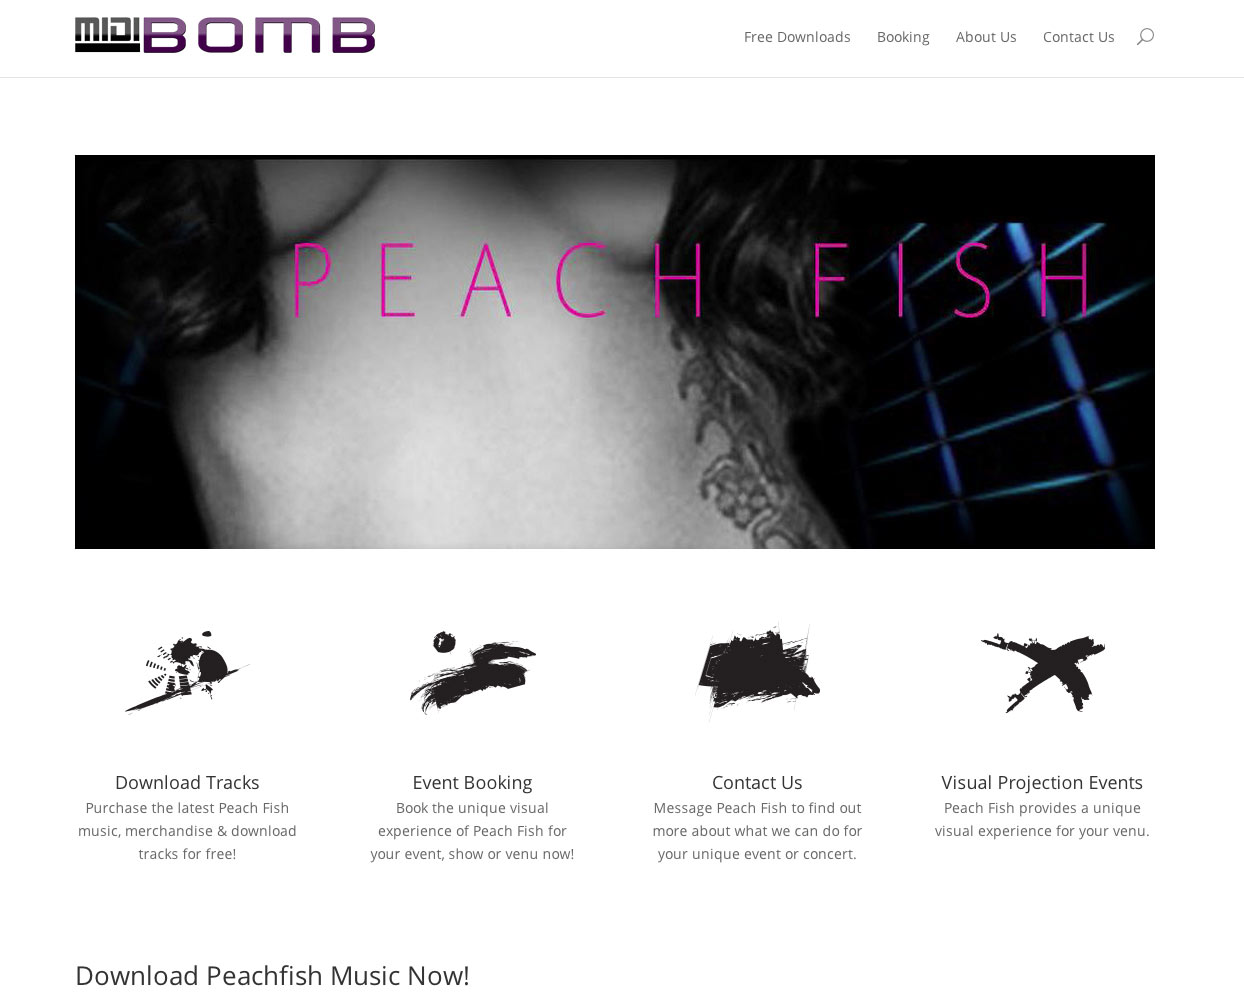 MidiBomb.com Website - The Music of Peach Fish